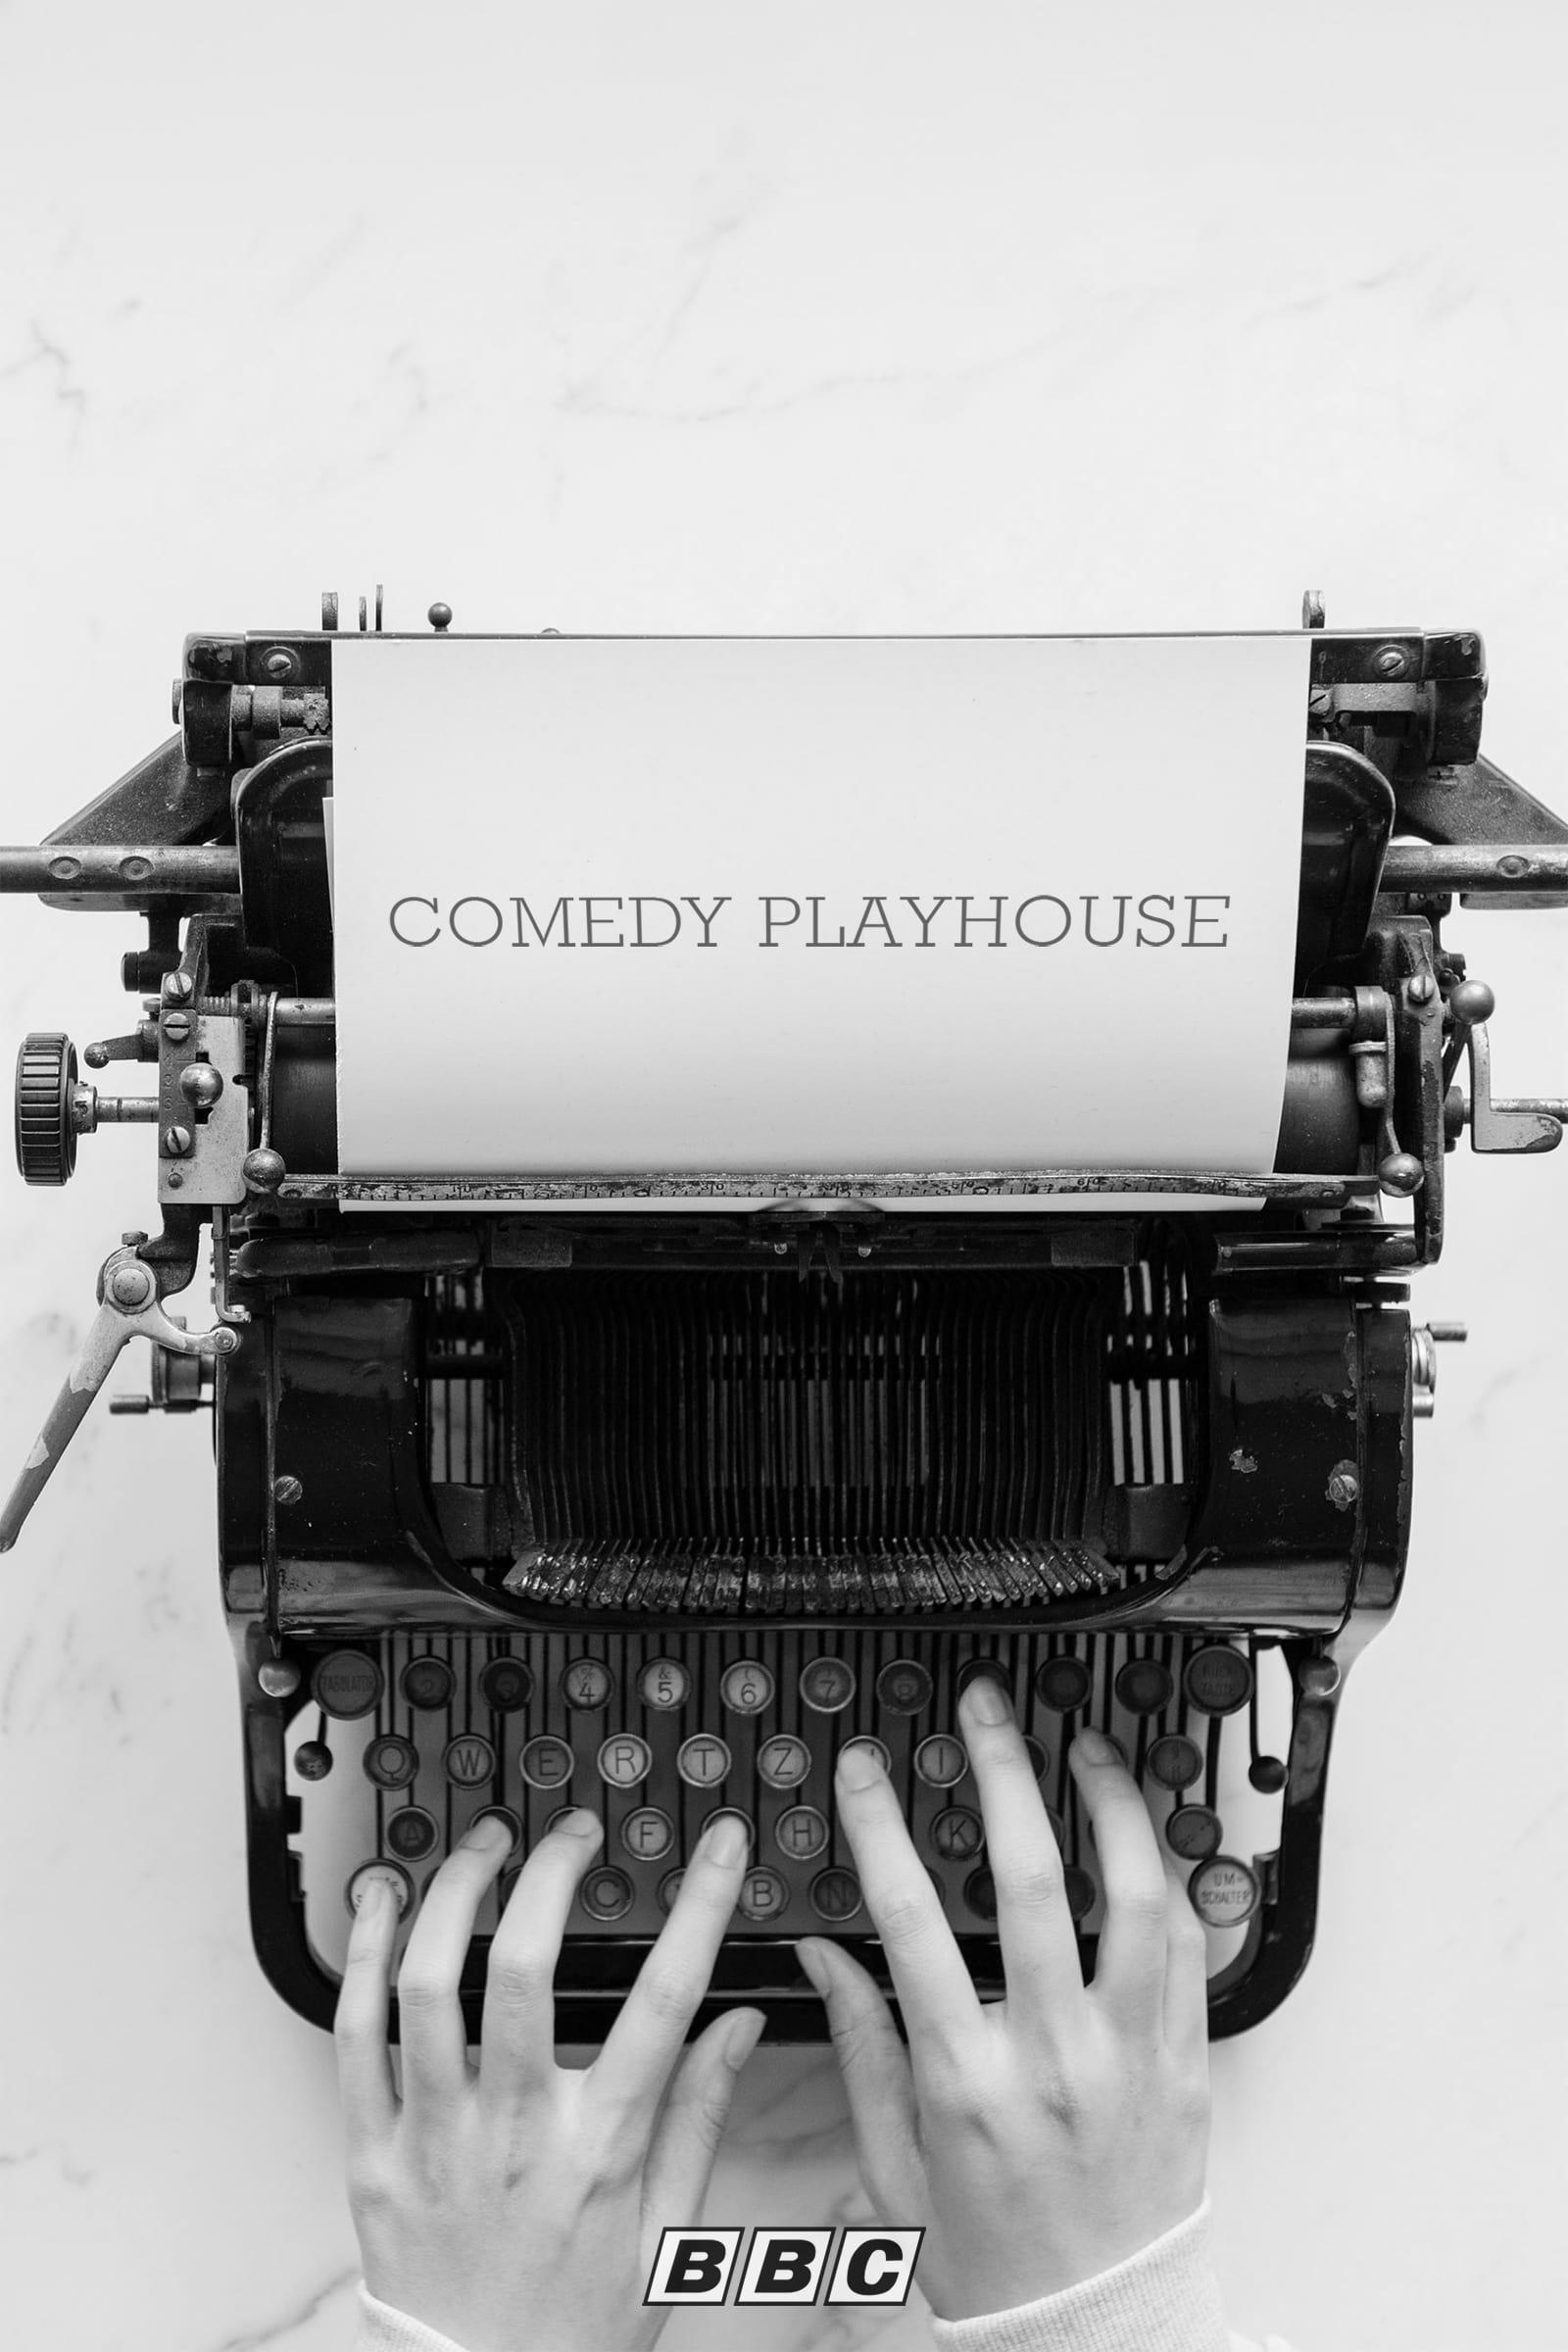 Comedy Playhouse (1961)